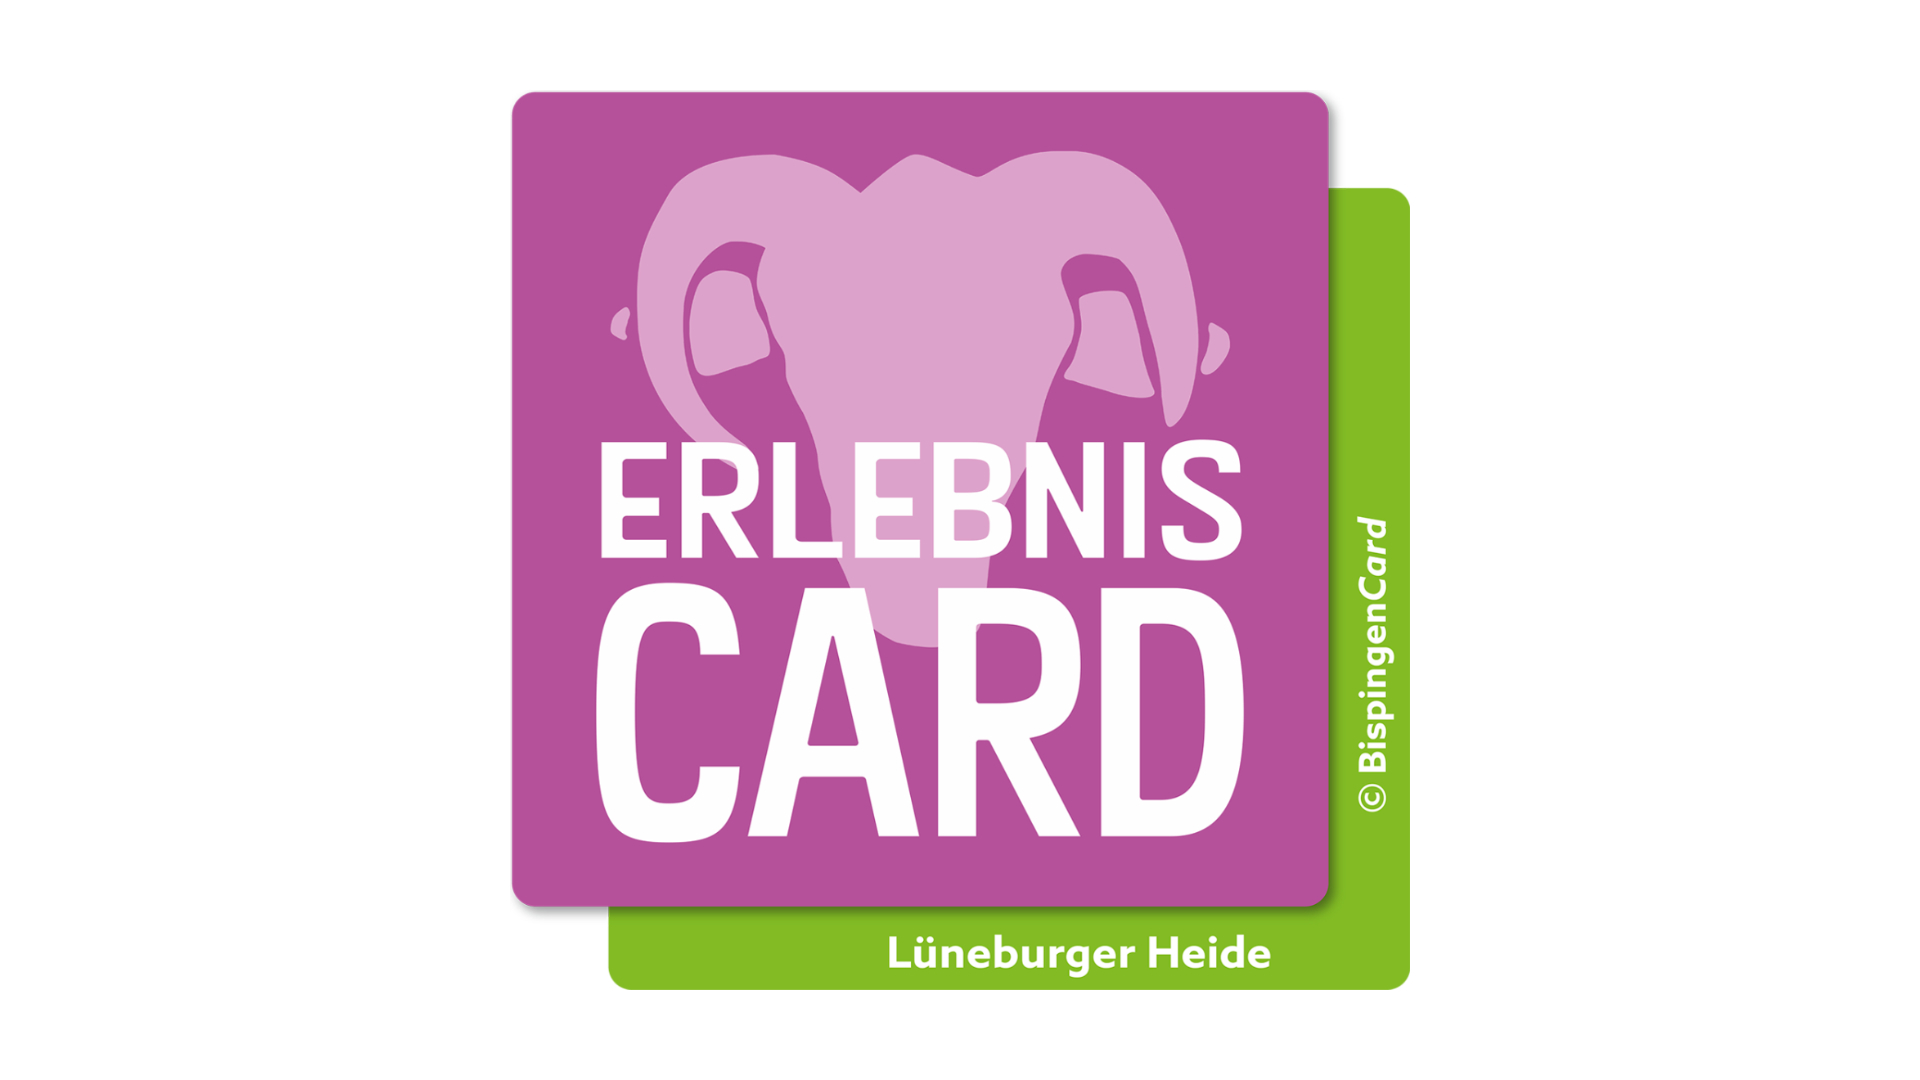 logo-erlebniscard-1920x1080